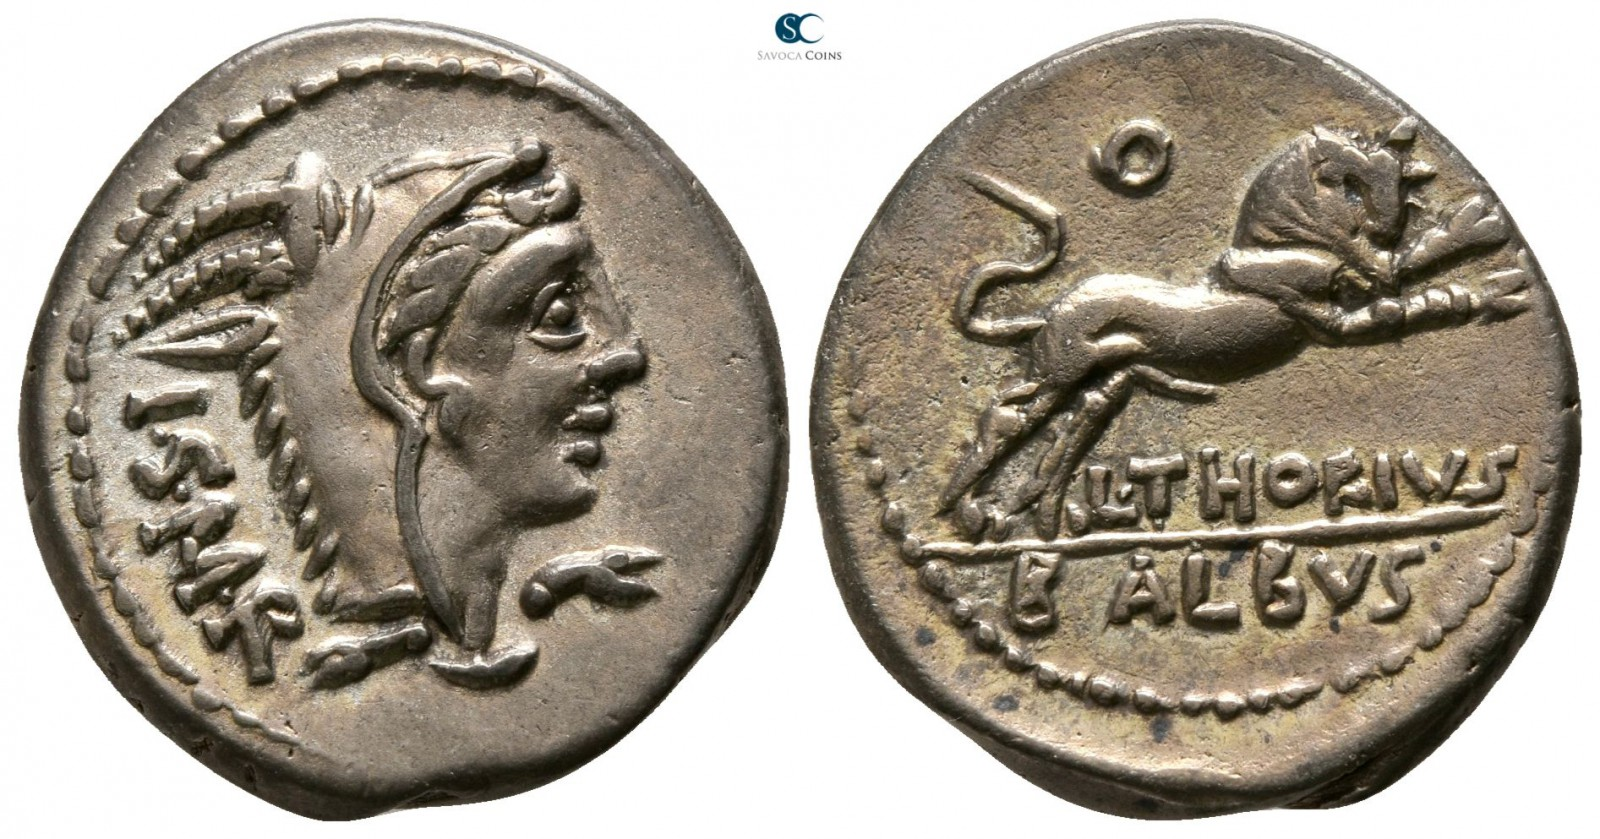 Savoca Coins 23erd Silver Auction 17-6-2018 Thoriu10